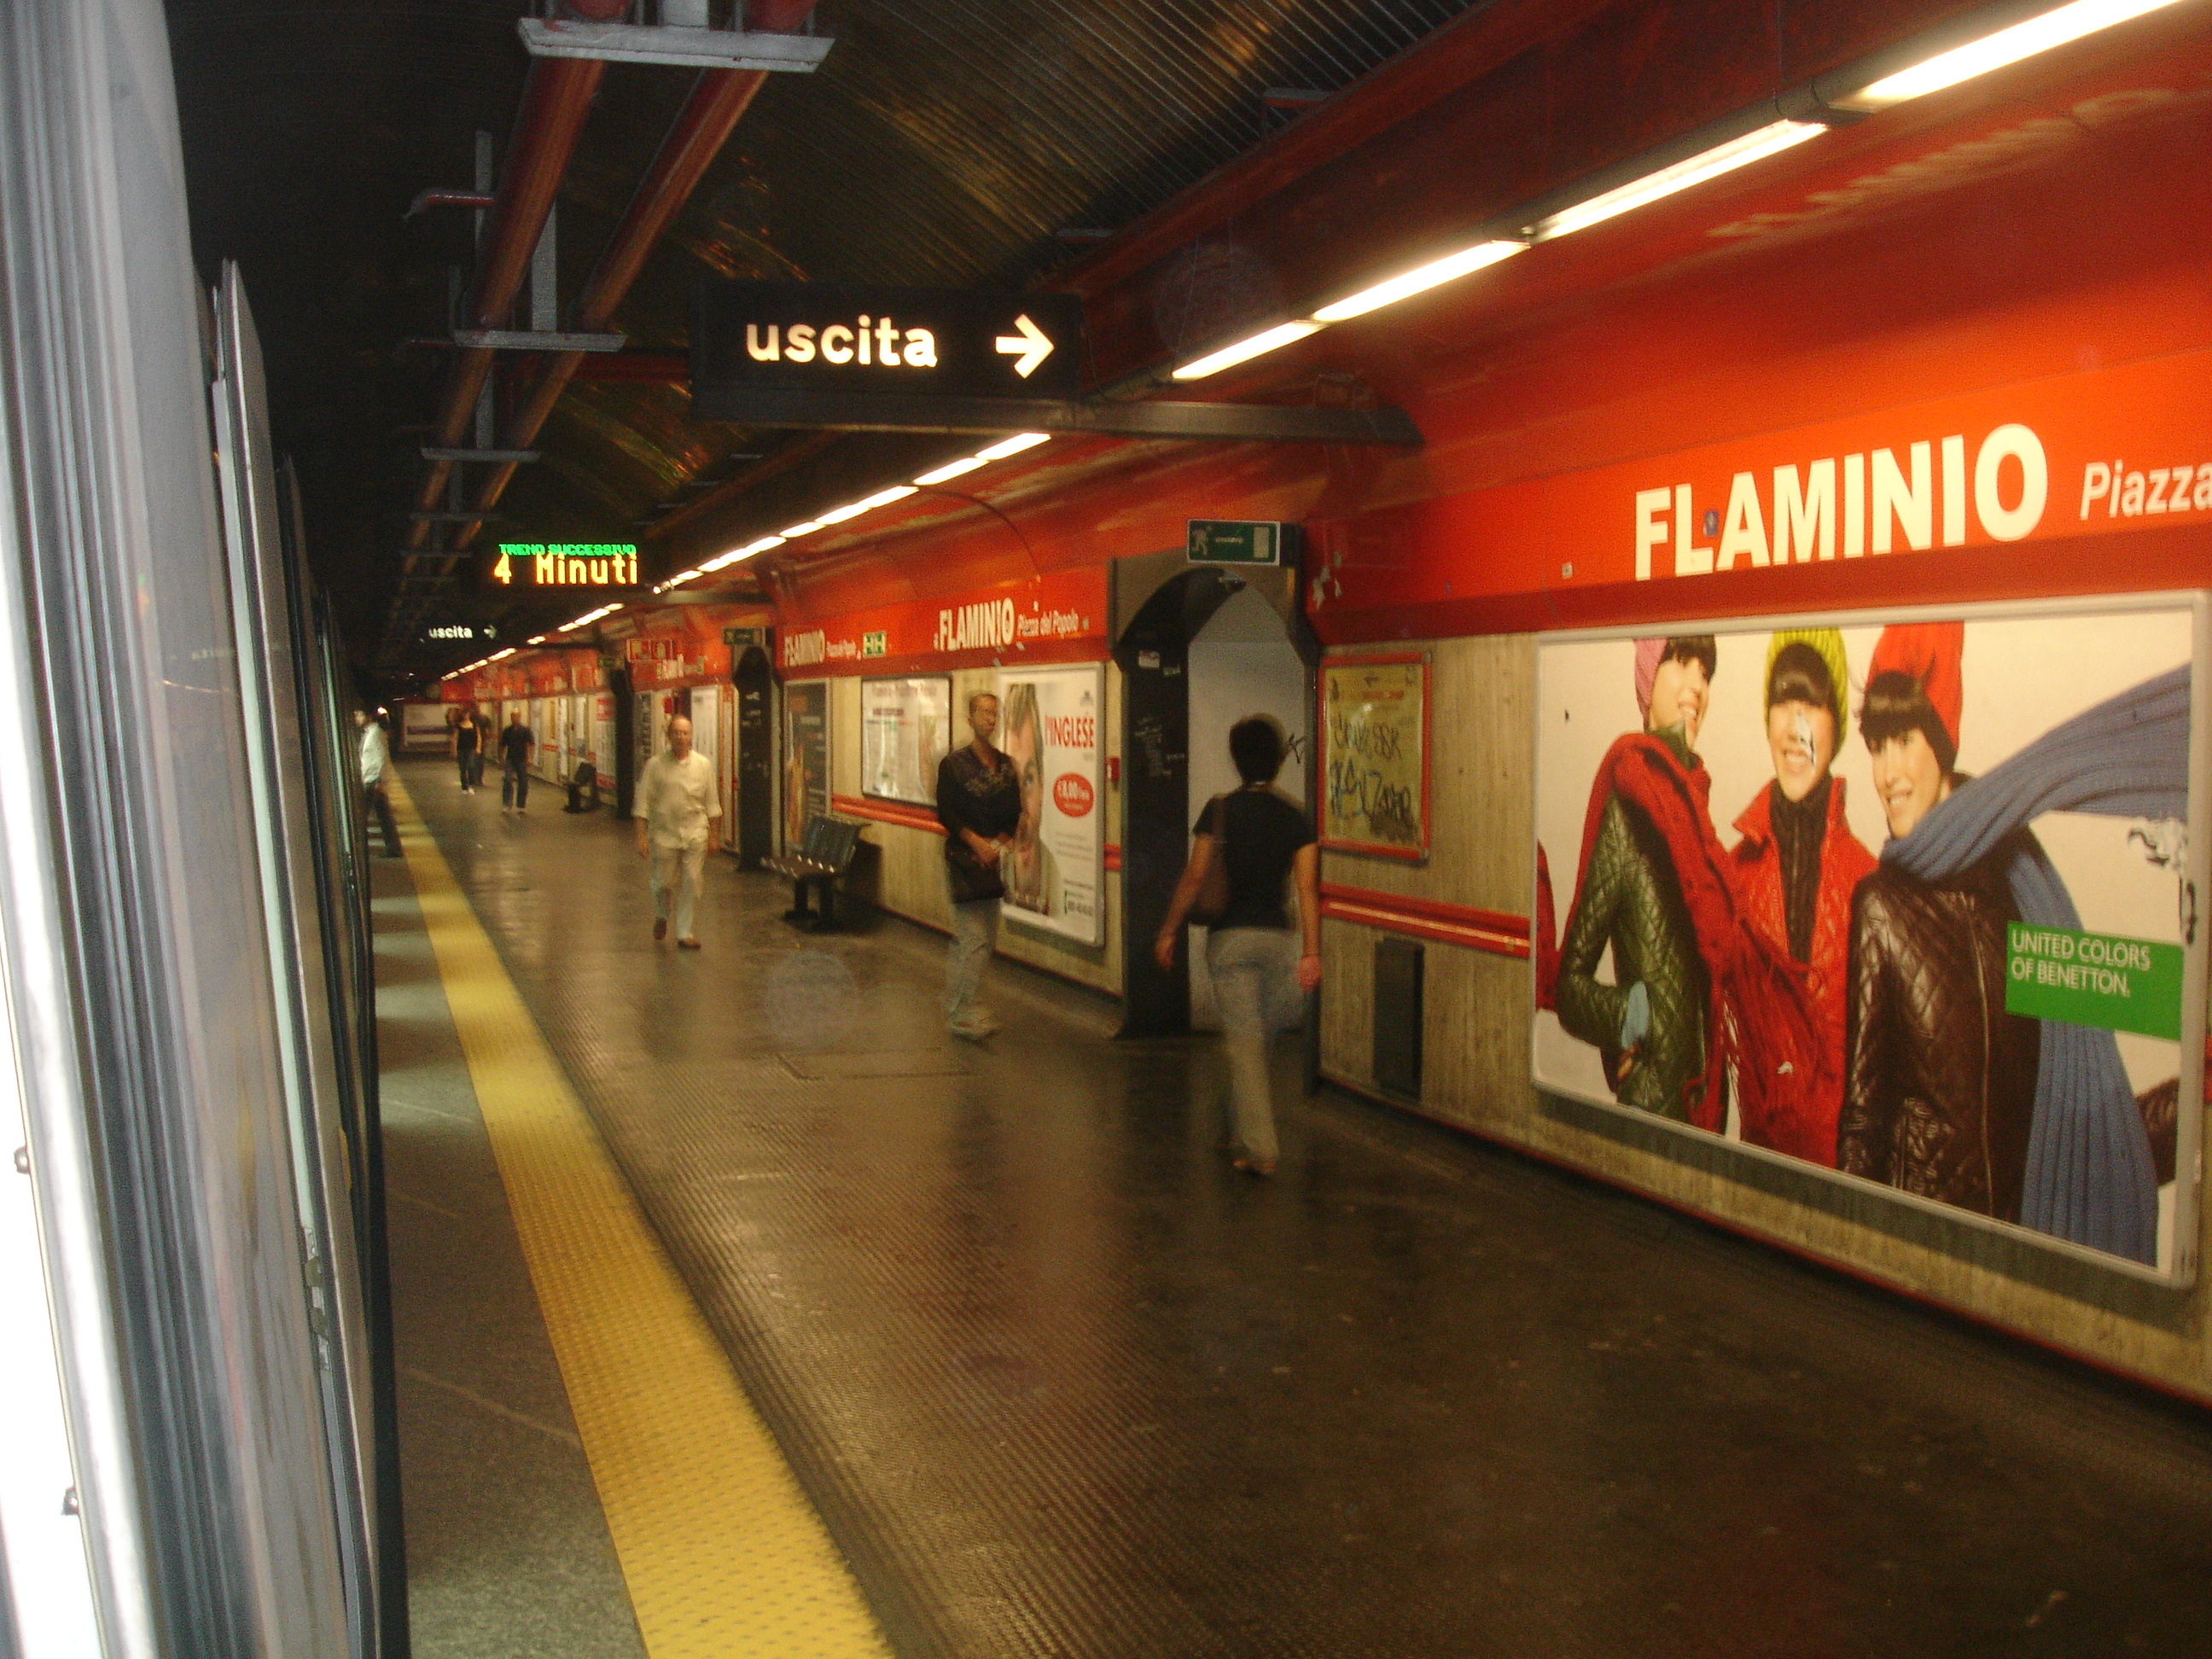 roma donna aggredita da borseggiatrici in metropolitana